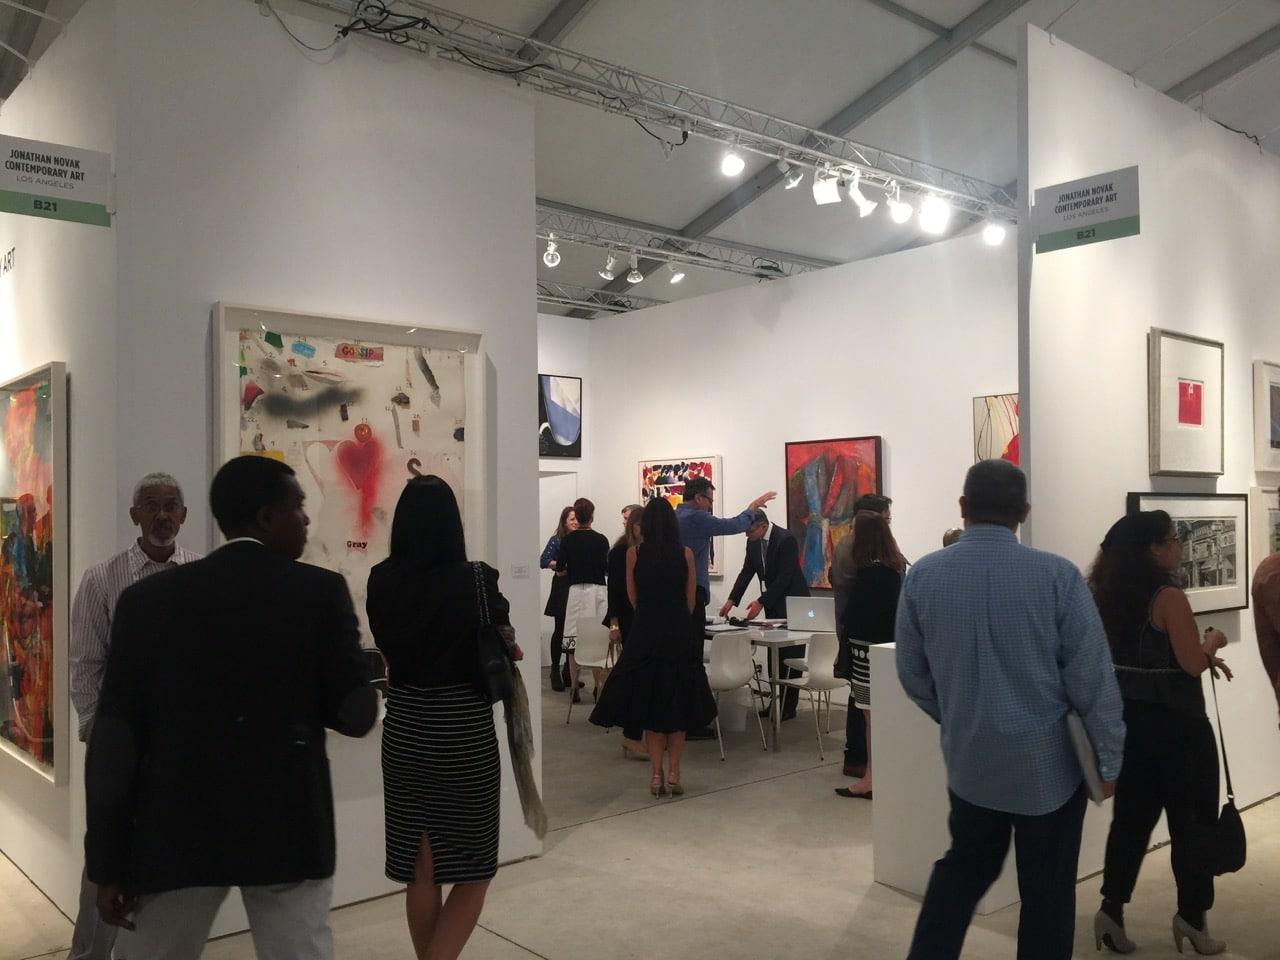 art-miami-art-fair-jonathan-novak-contemporary-art-2